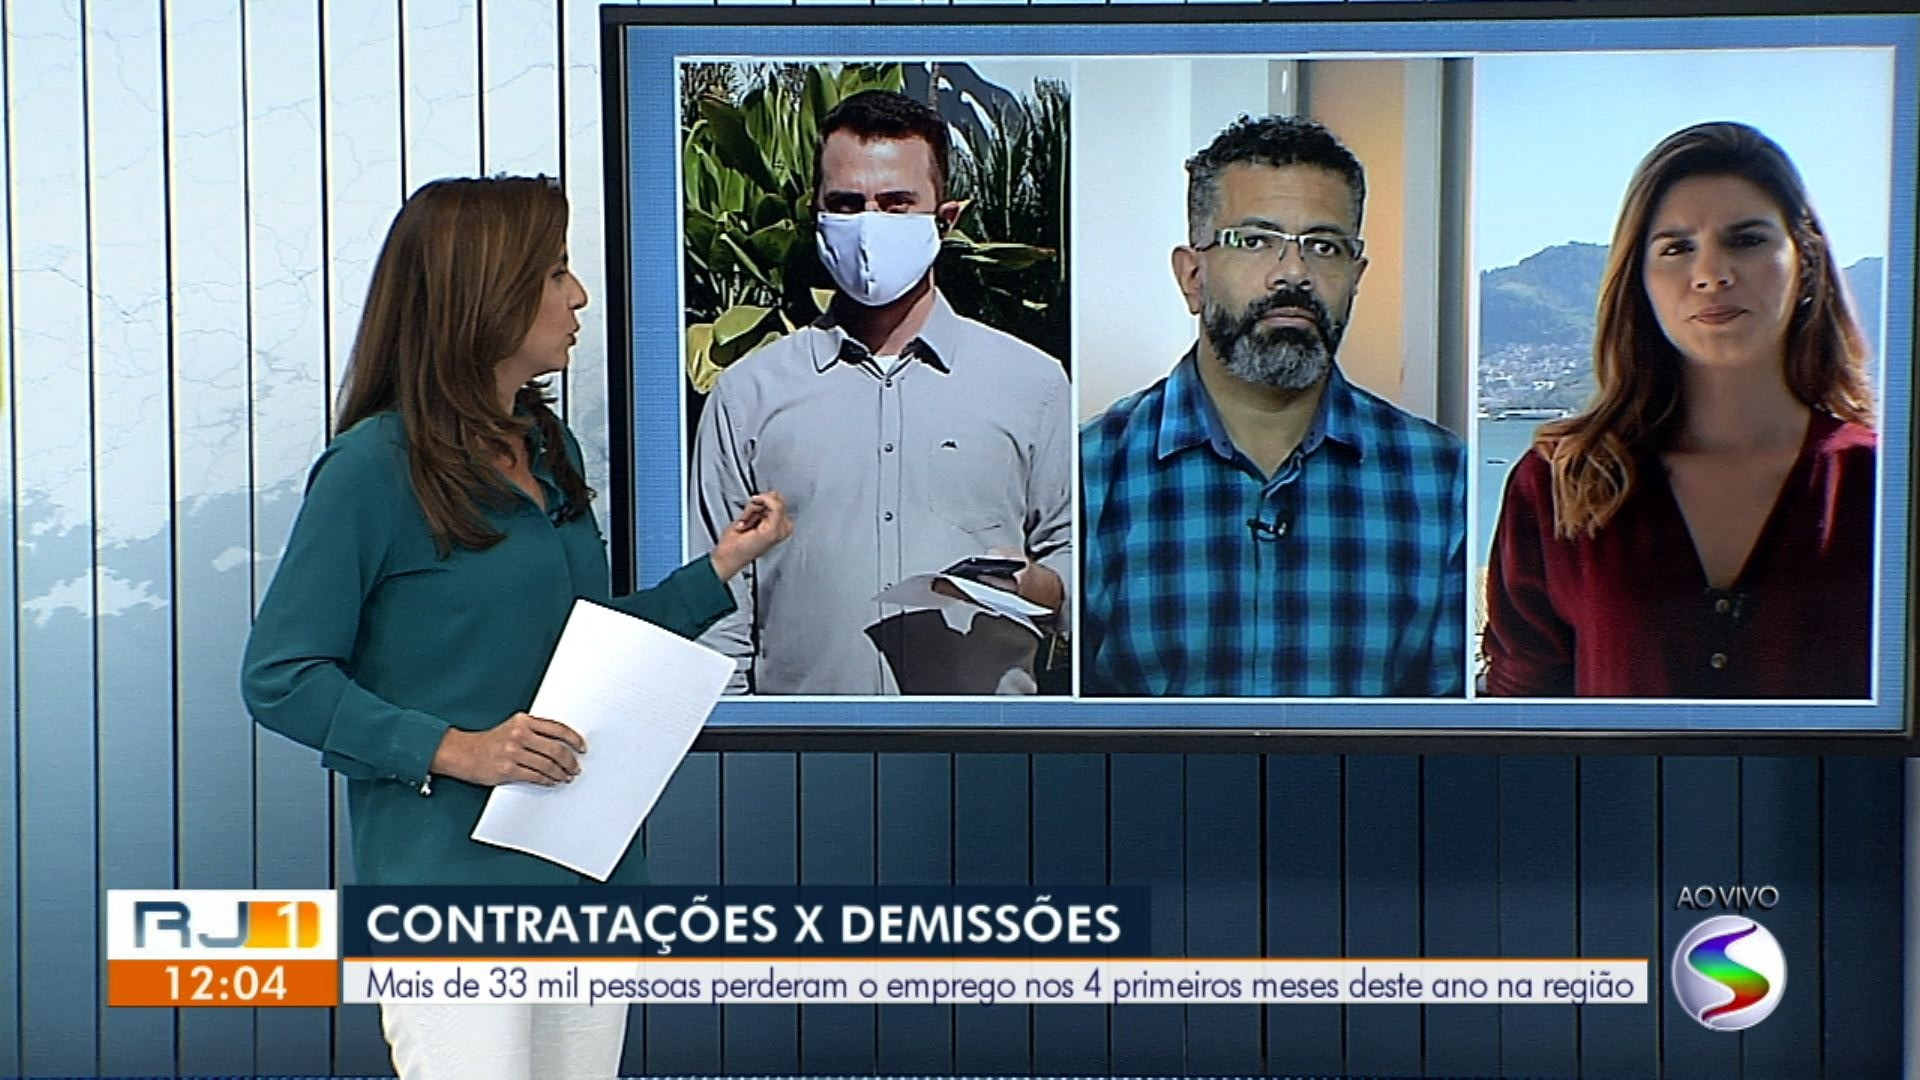 VÍDEOS: RJ1 TV Rio Sul de segunda-feira, 1 de junho